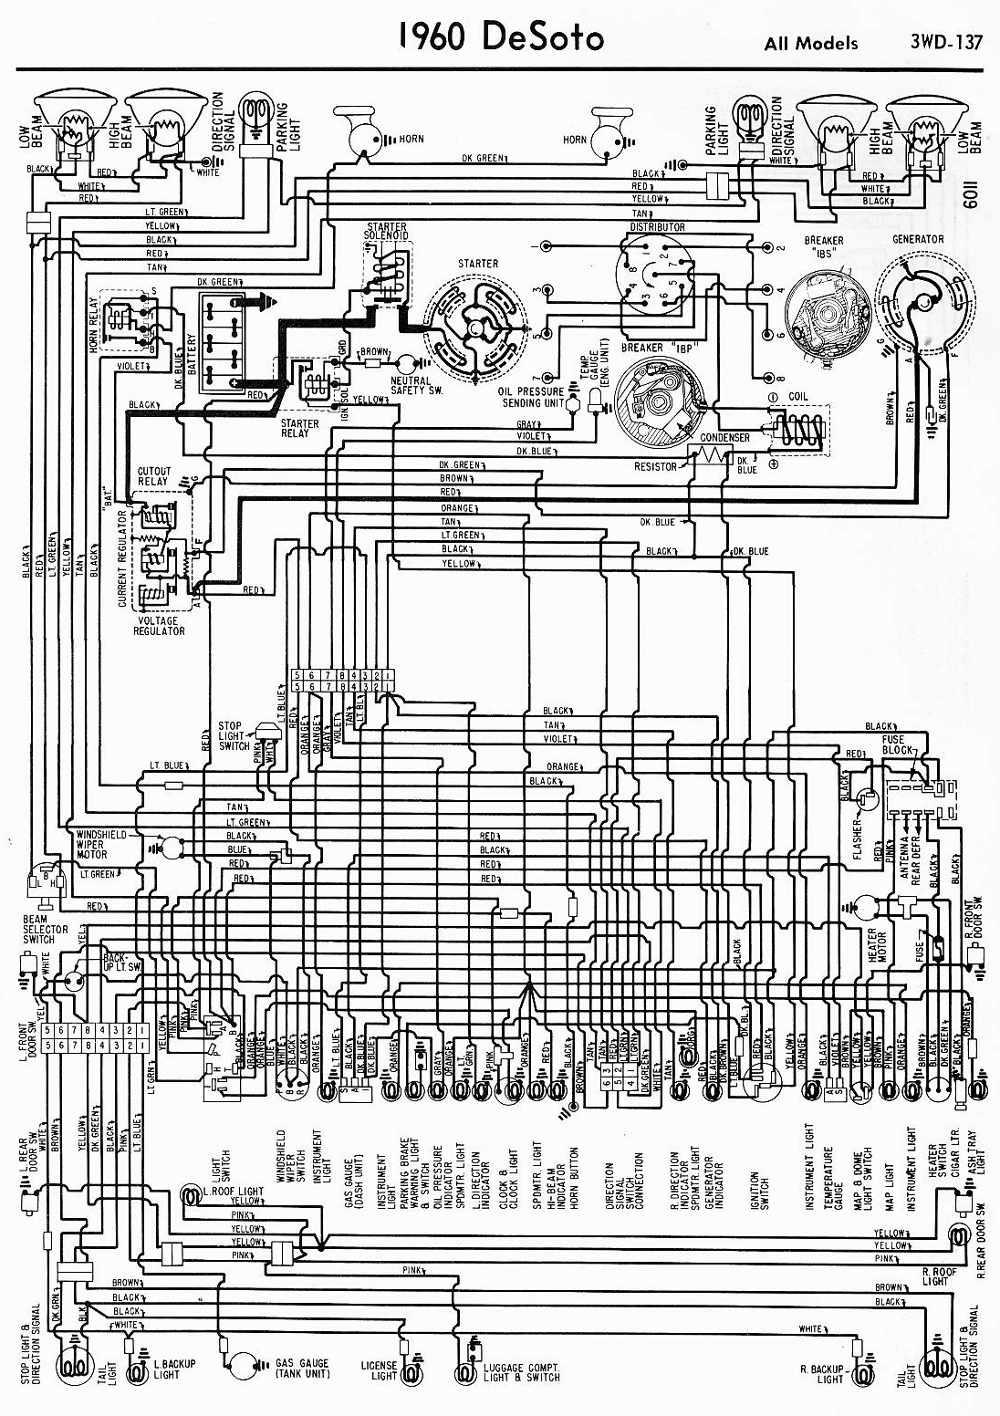 De Soto Car Manuals Wiring Diagrams Pdf Fault Codes 1948 Chrysler Windsor Diagram Download